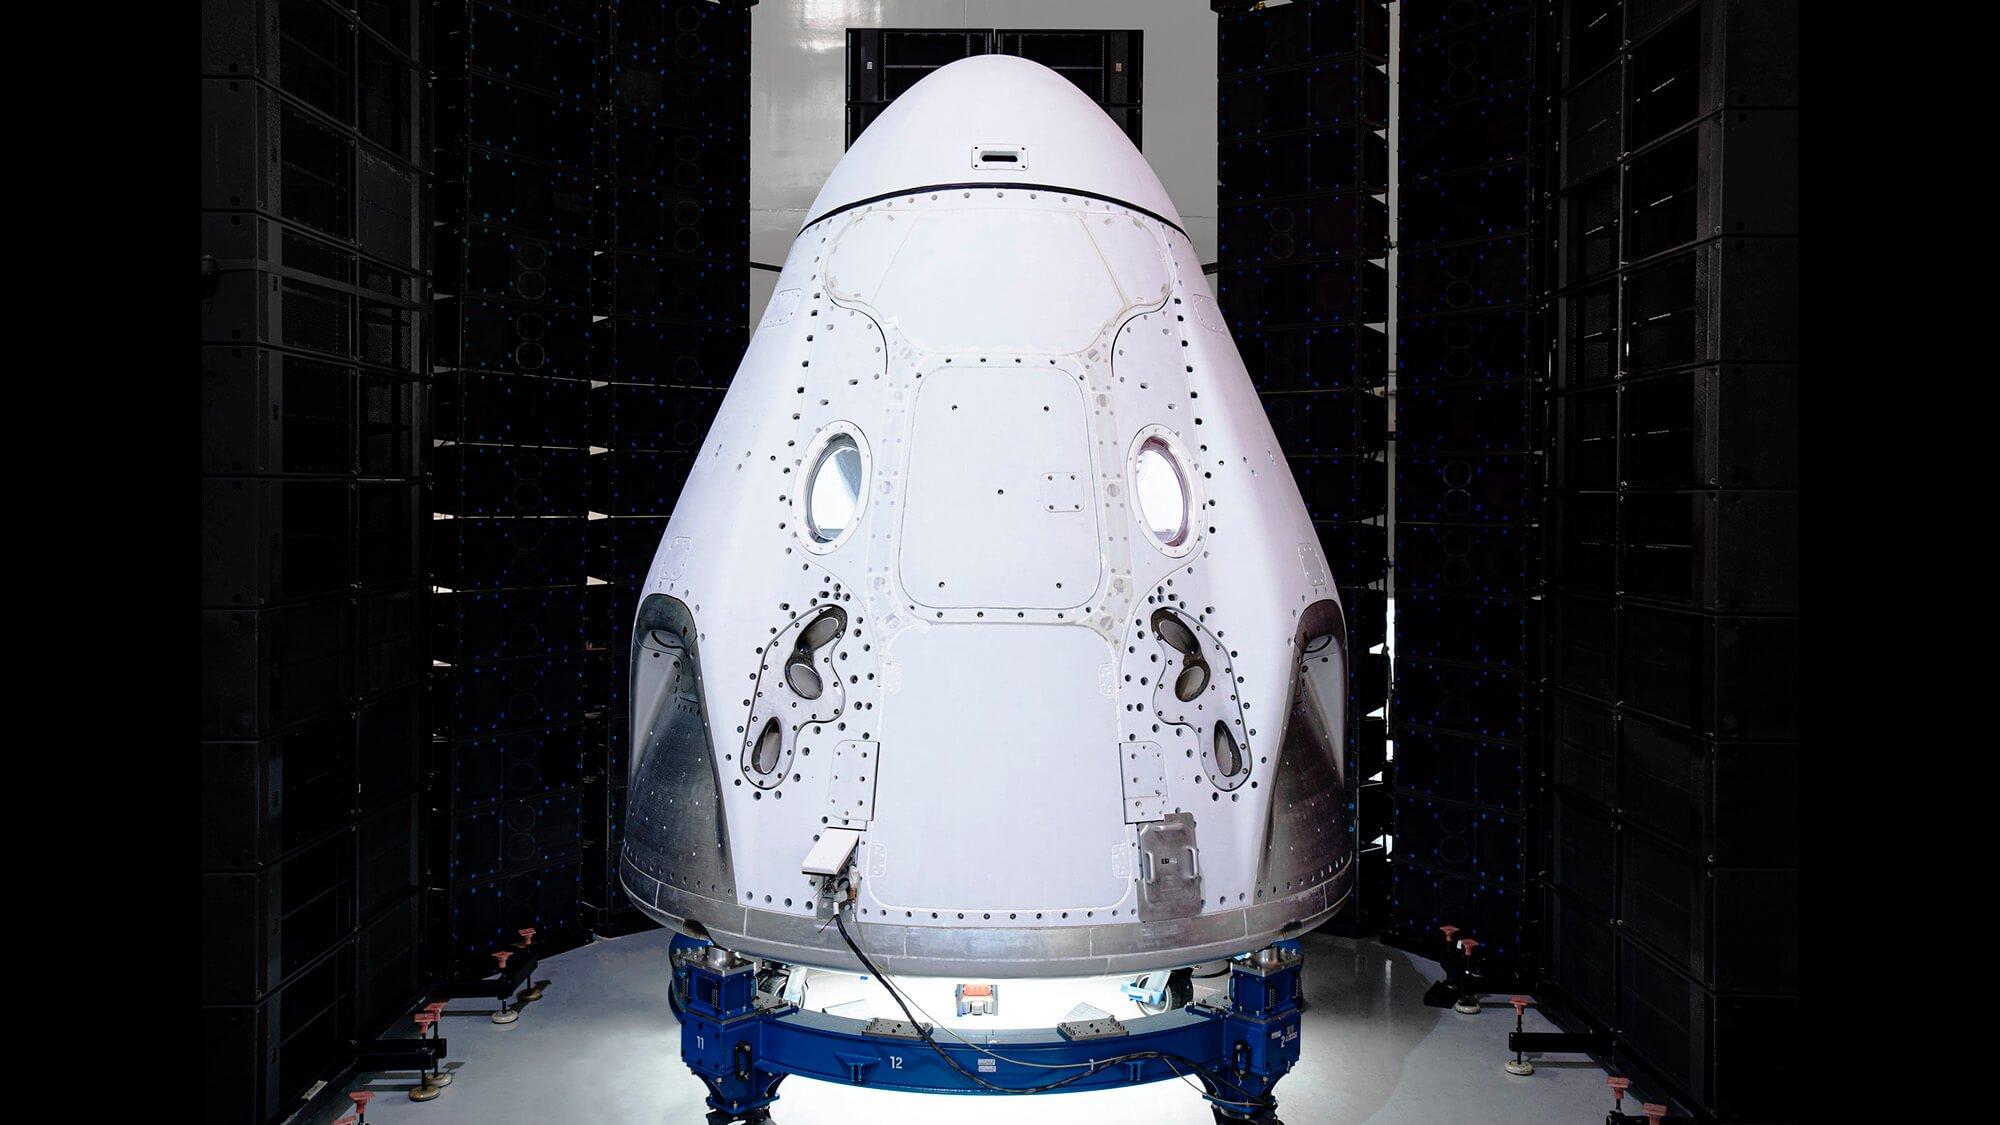 SpaceX может повторно использовать Falcon 9 и Crew Dragon для доставки людей на МКС